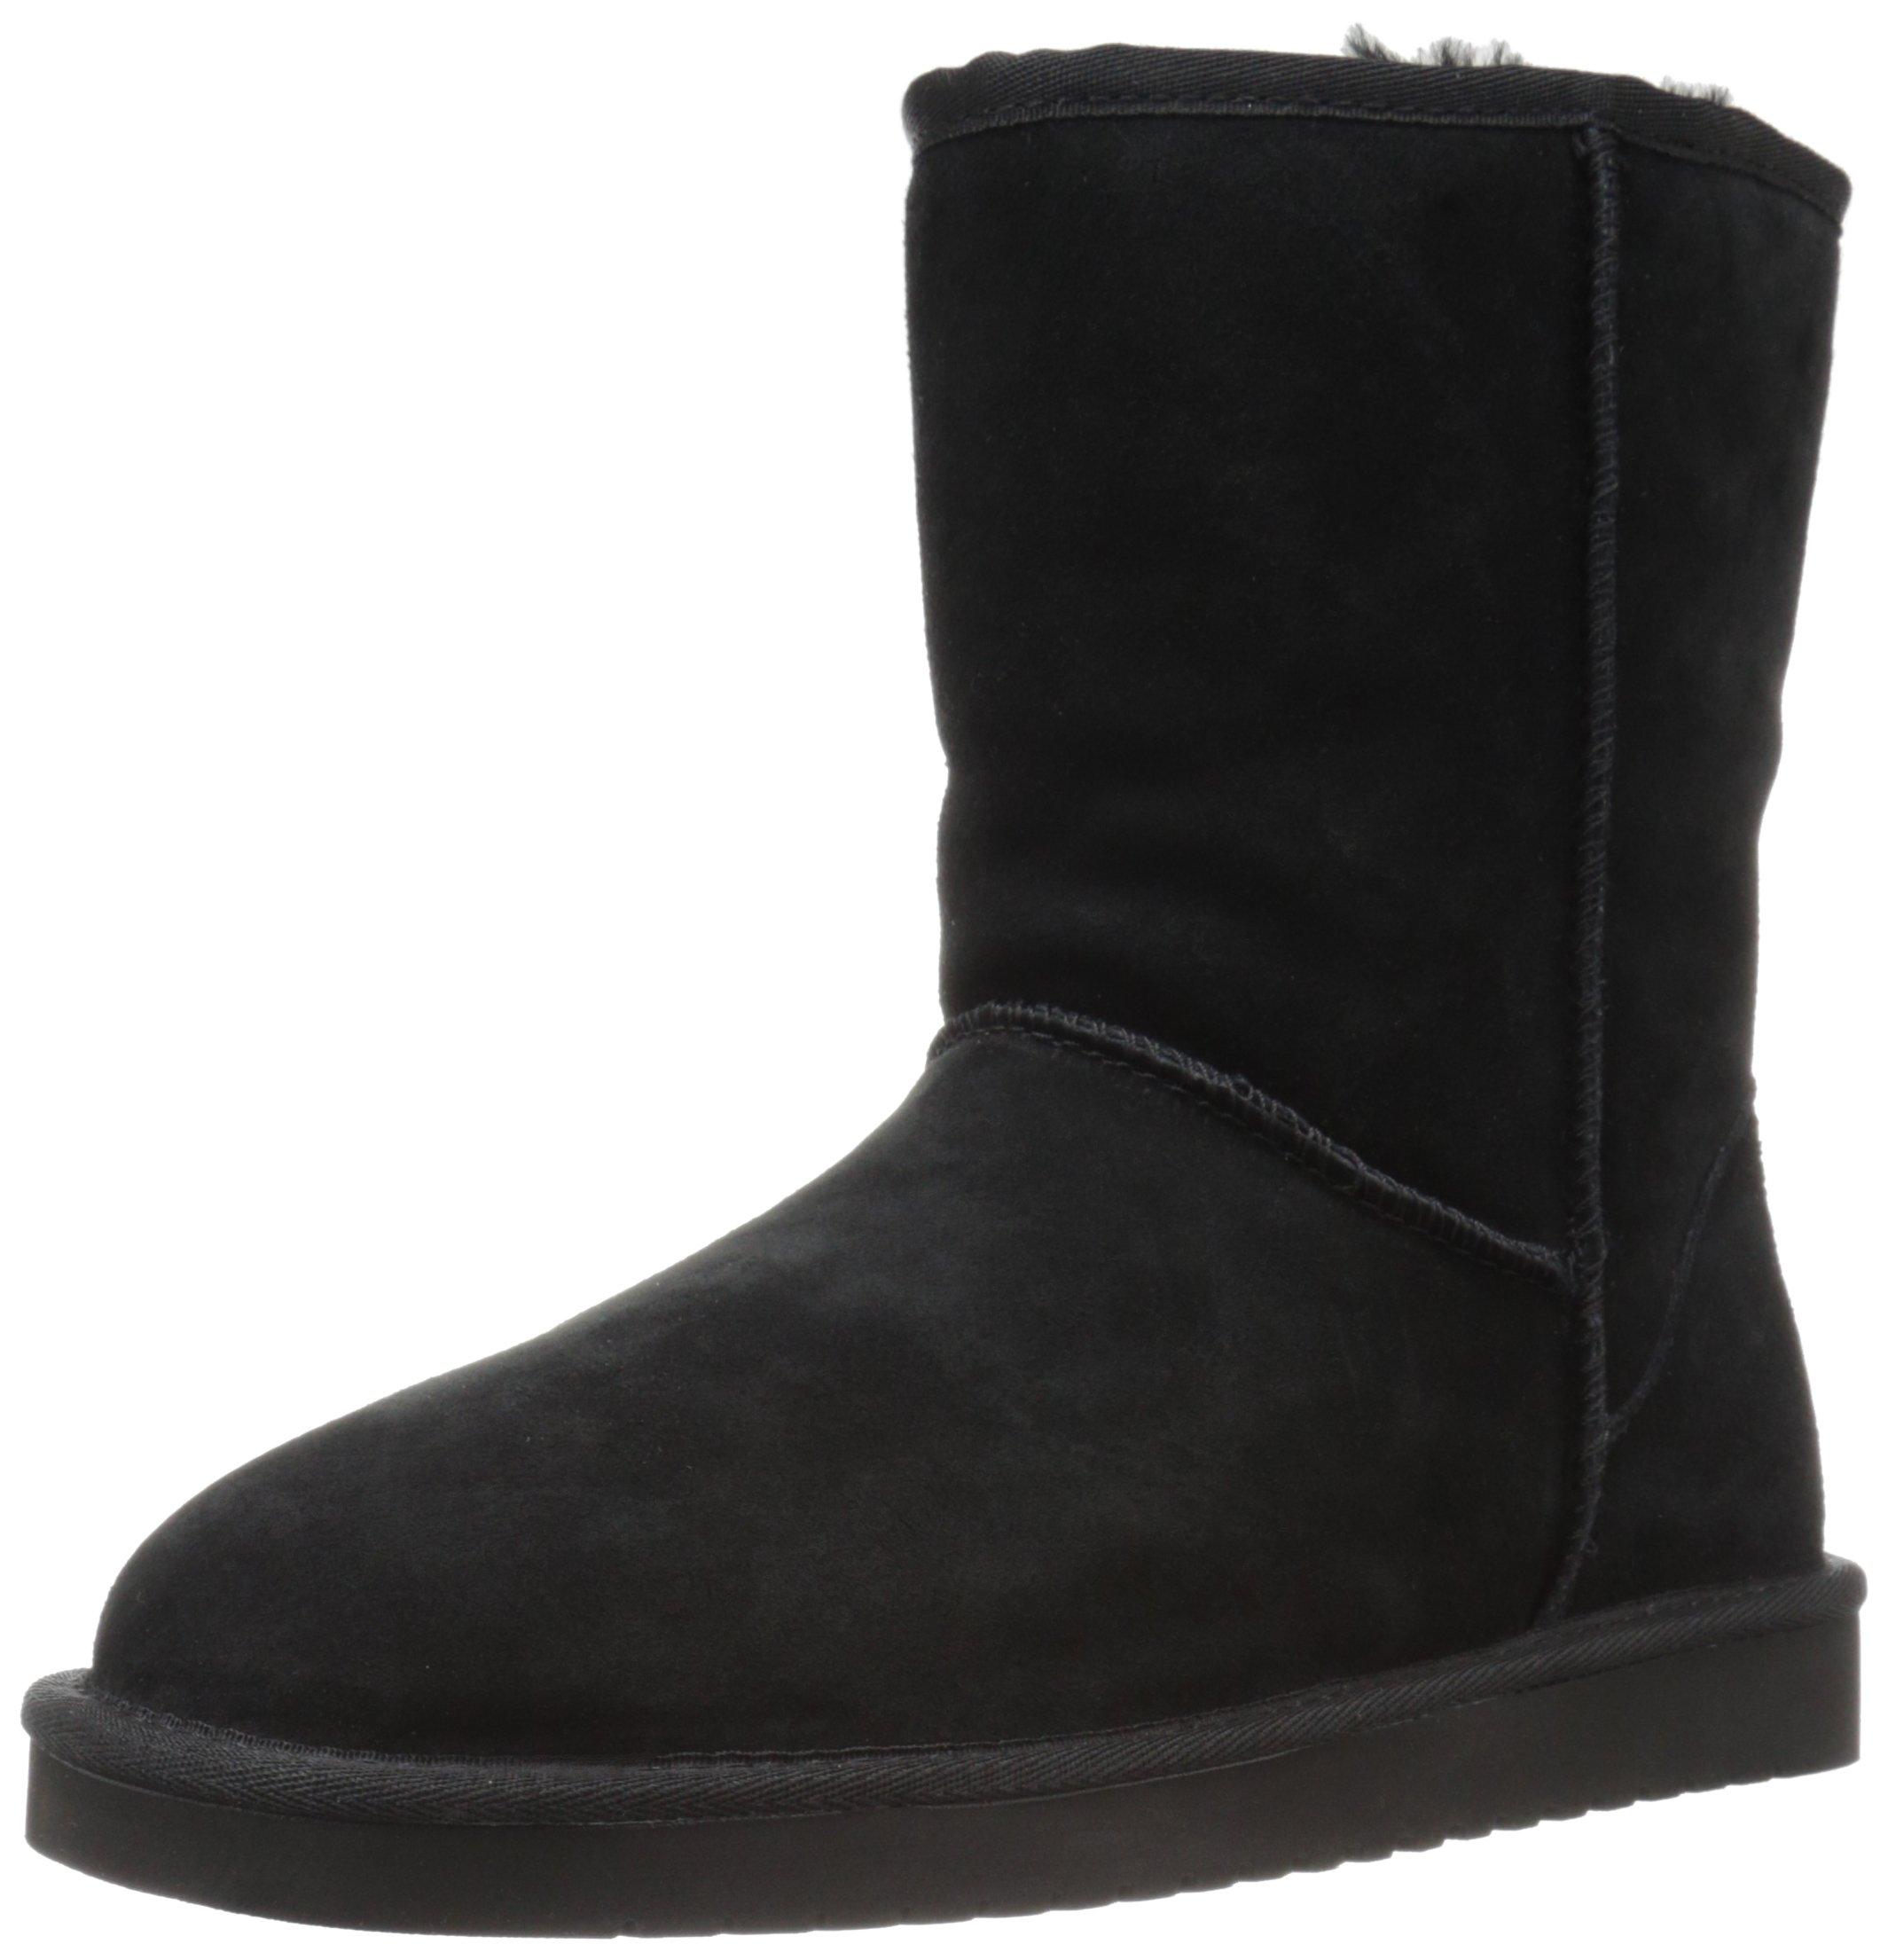 Koolaburra by UGG Women's Koola Short Fashion Boot, Black, 06 M US